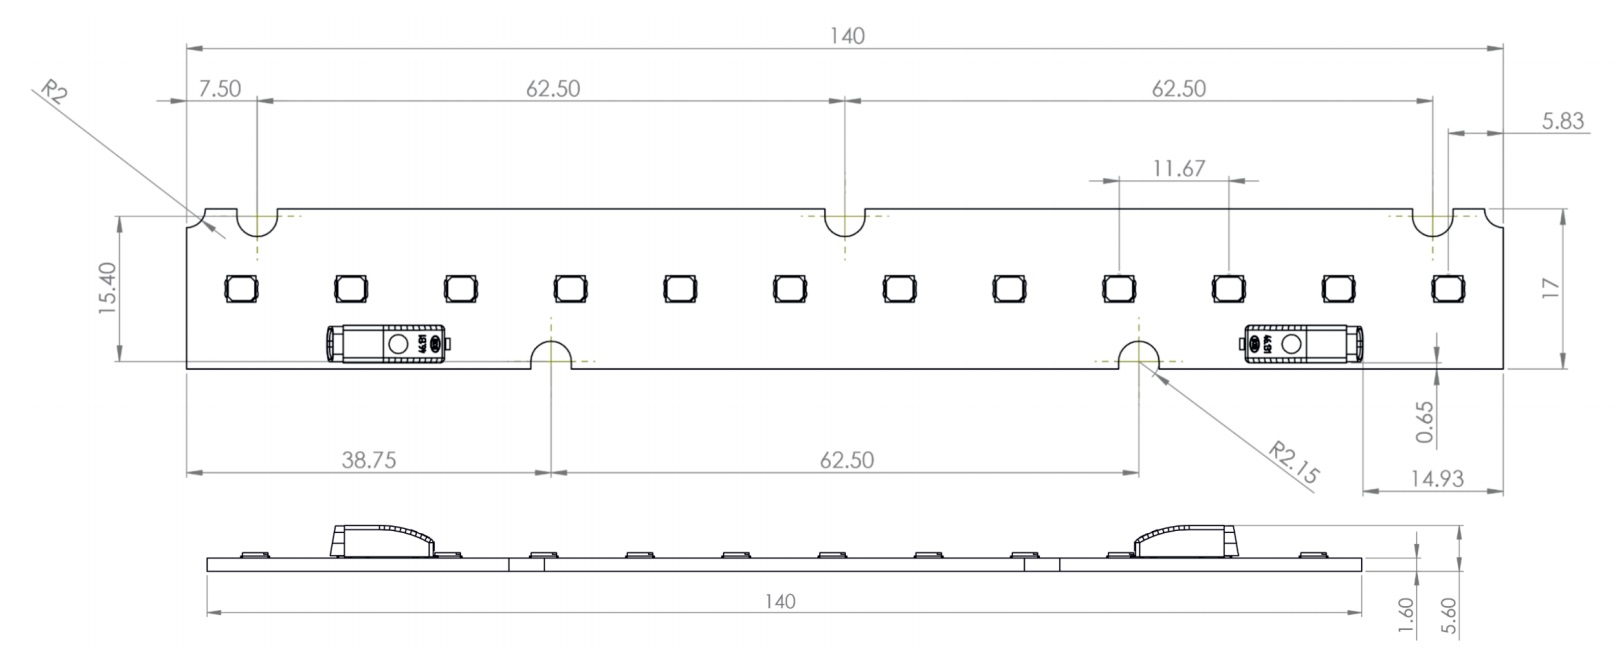 LED moduliai bendram apšvietimui